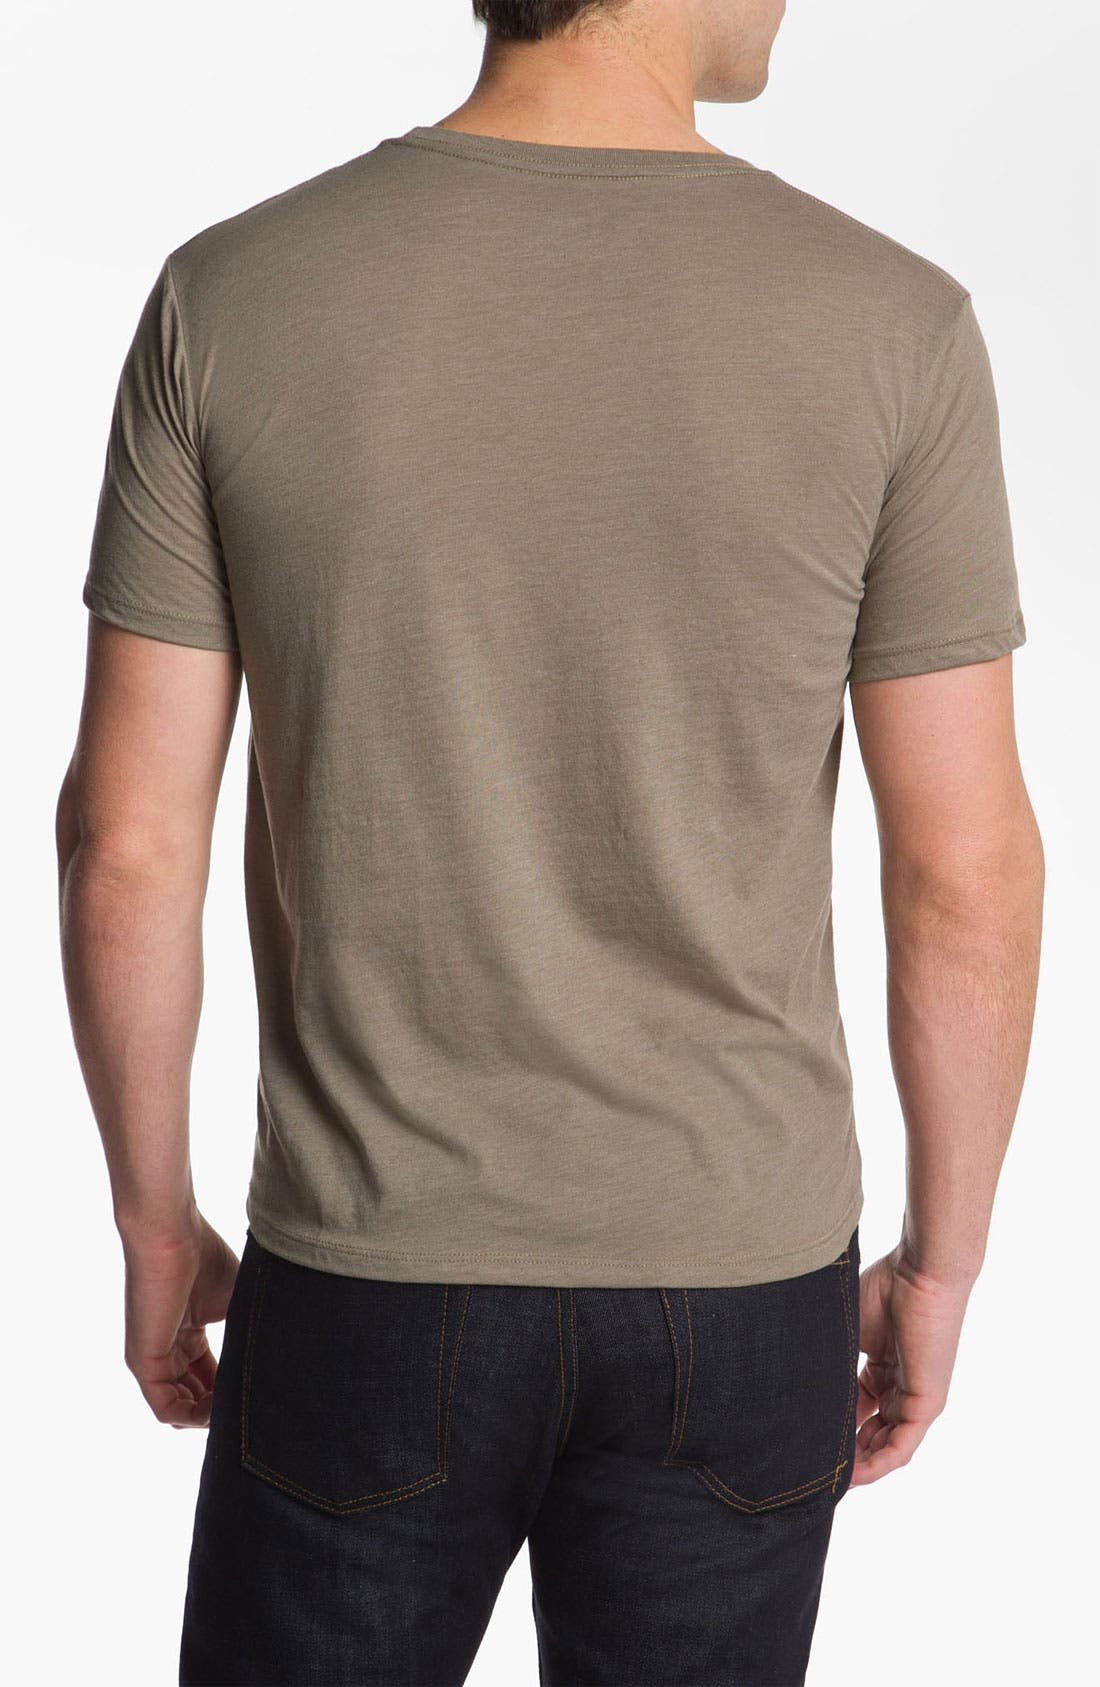 Alternate Image 2  - Headline Shirts 'Who Wants a Shot?' T-Shirt